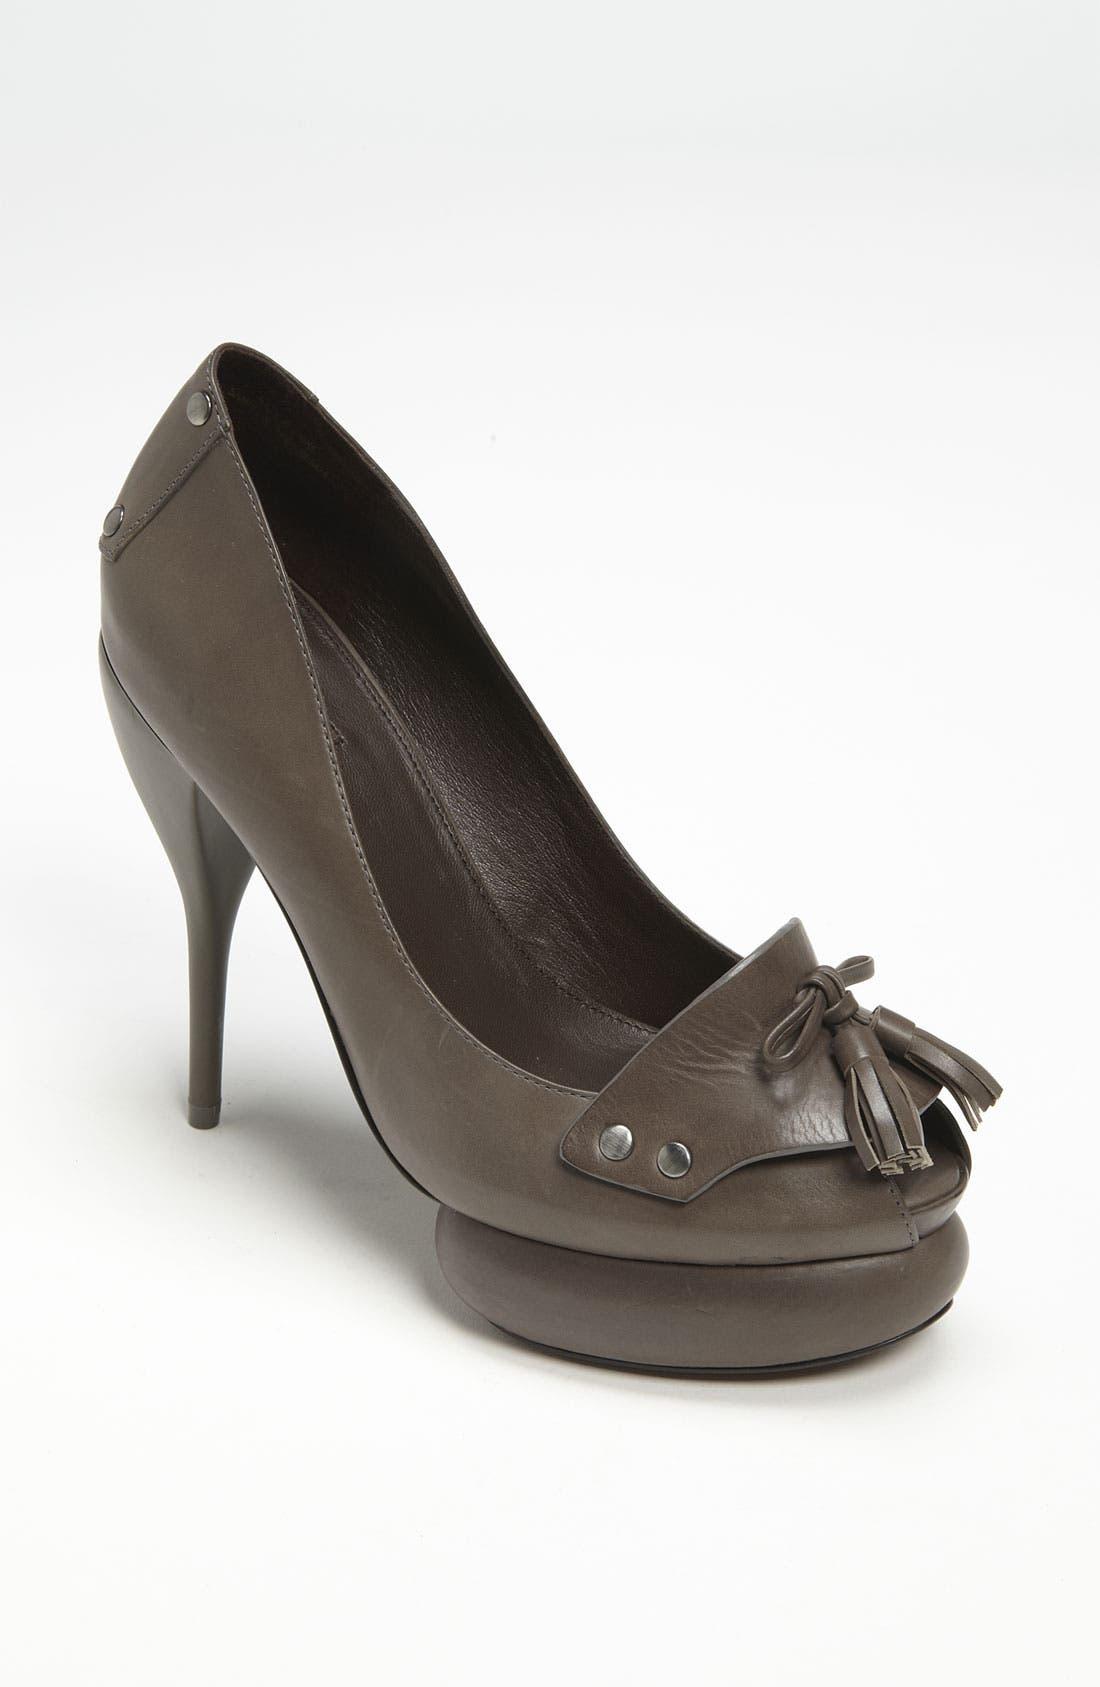 Main Image - Vera Wang Footwear 'Corrinne' Pump